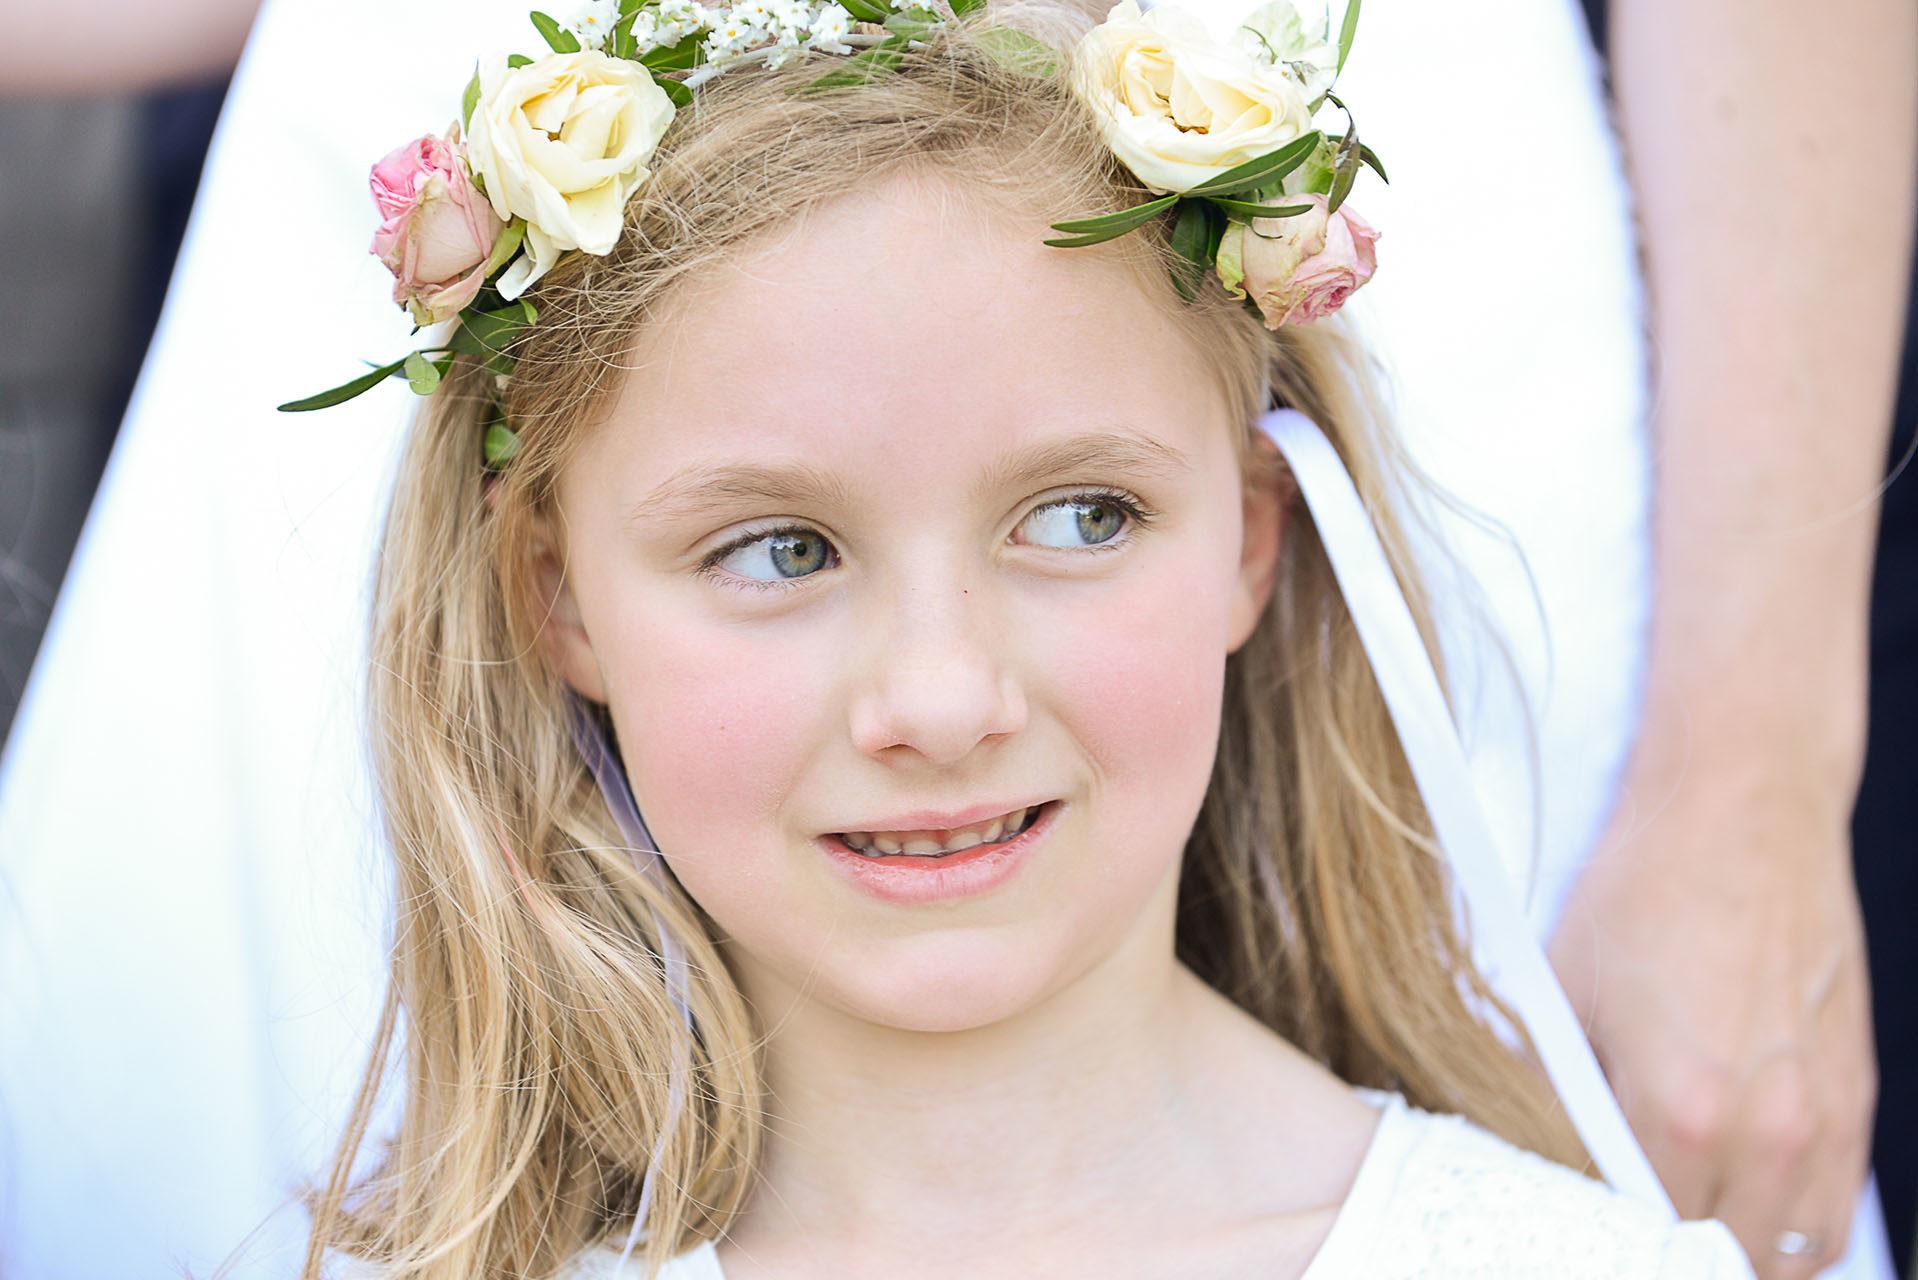 photographe-mariage-maya-angelsen-ile-de-france-val-de-marne